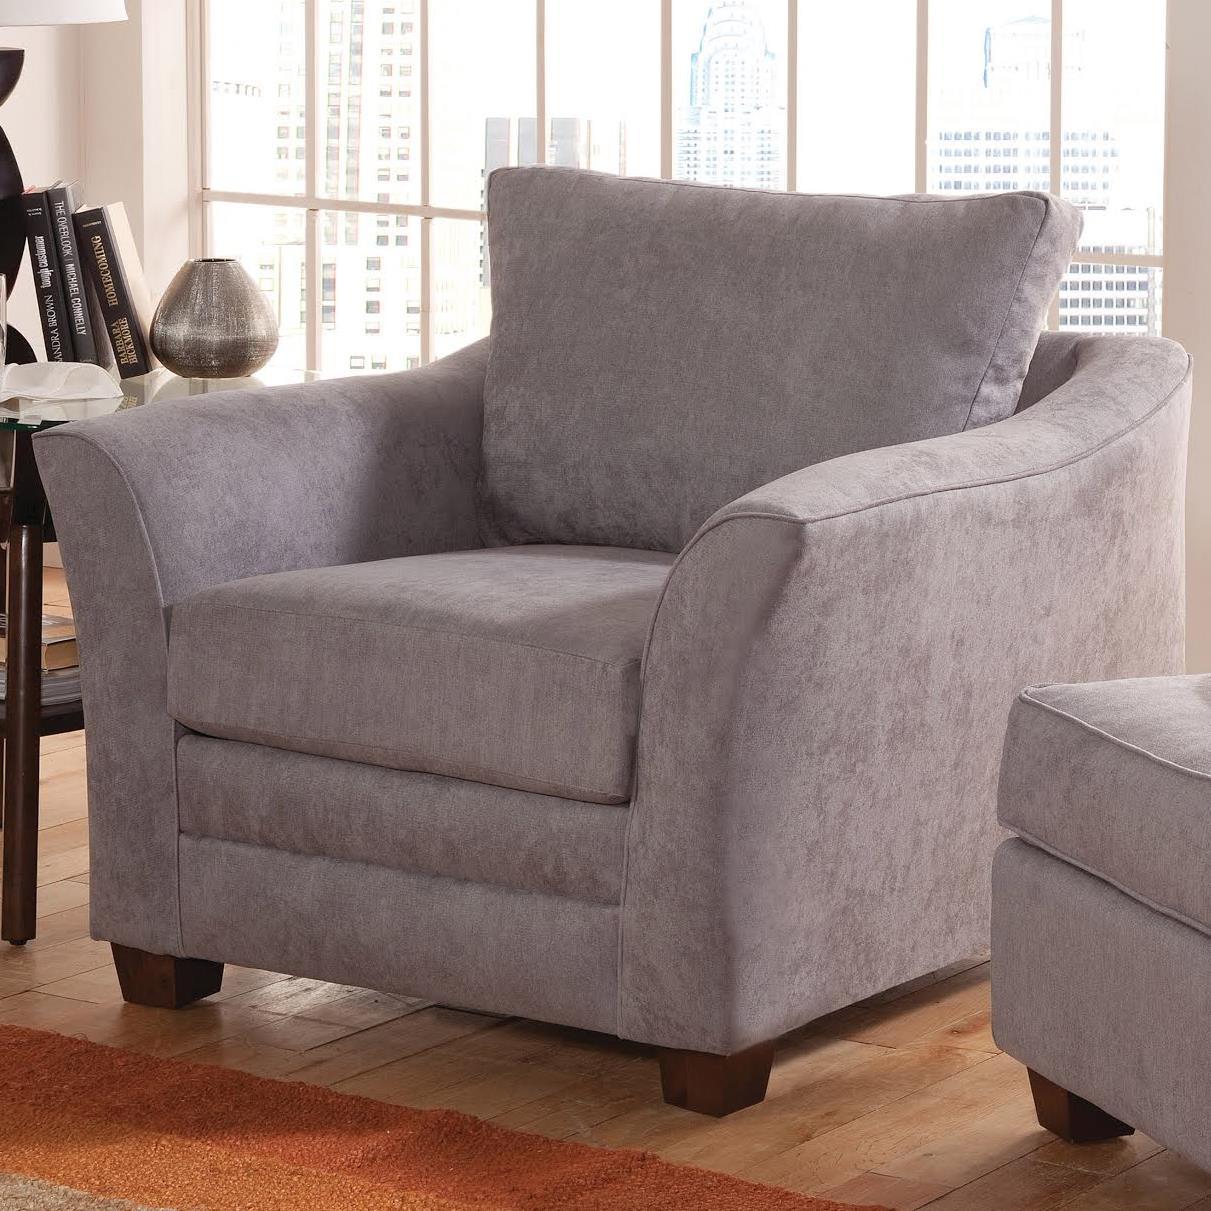 Belfort Essentials Hatfield Chair - Item Number: 940-10-LightGray